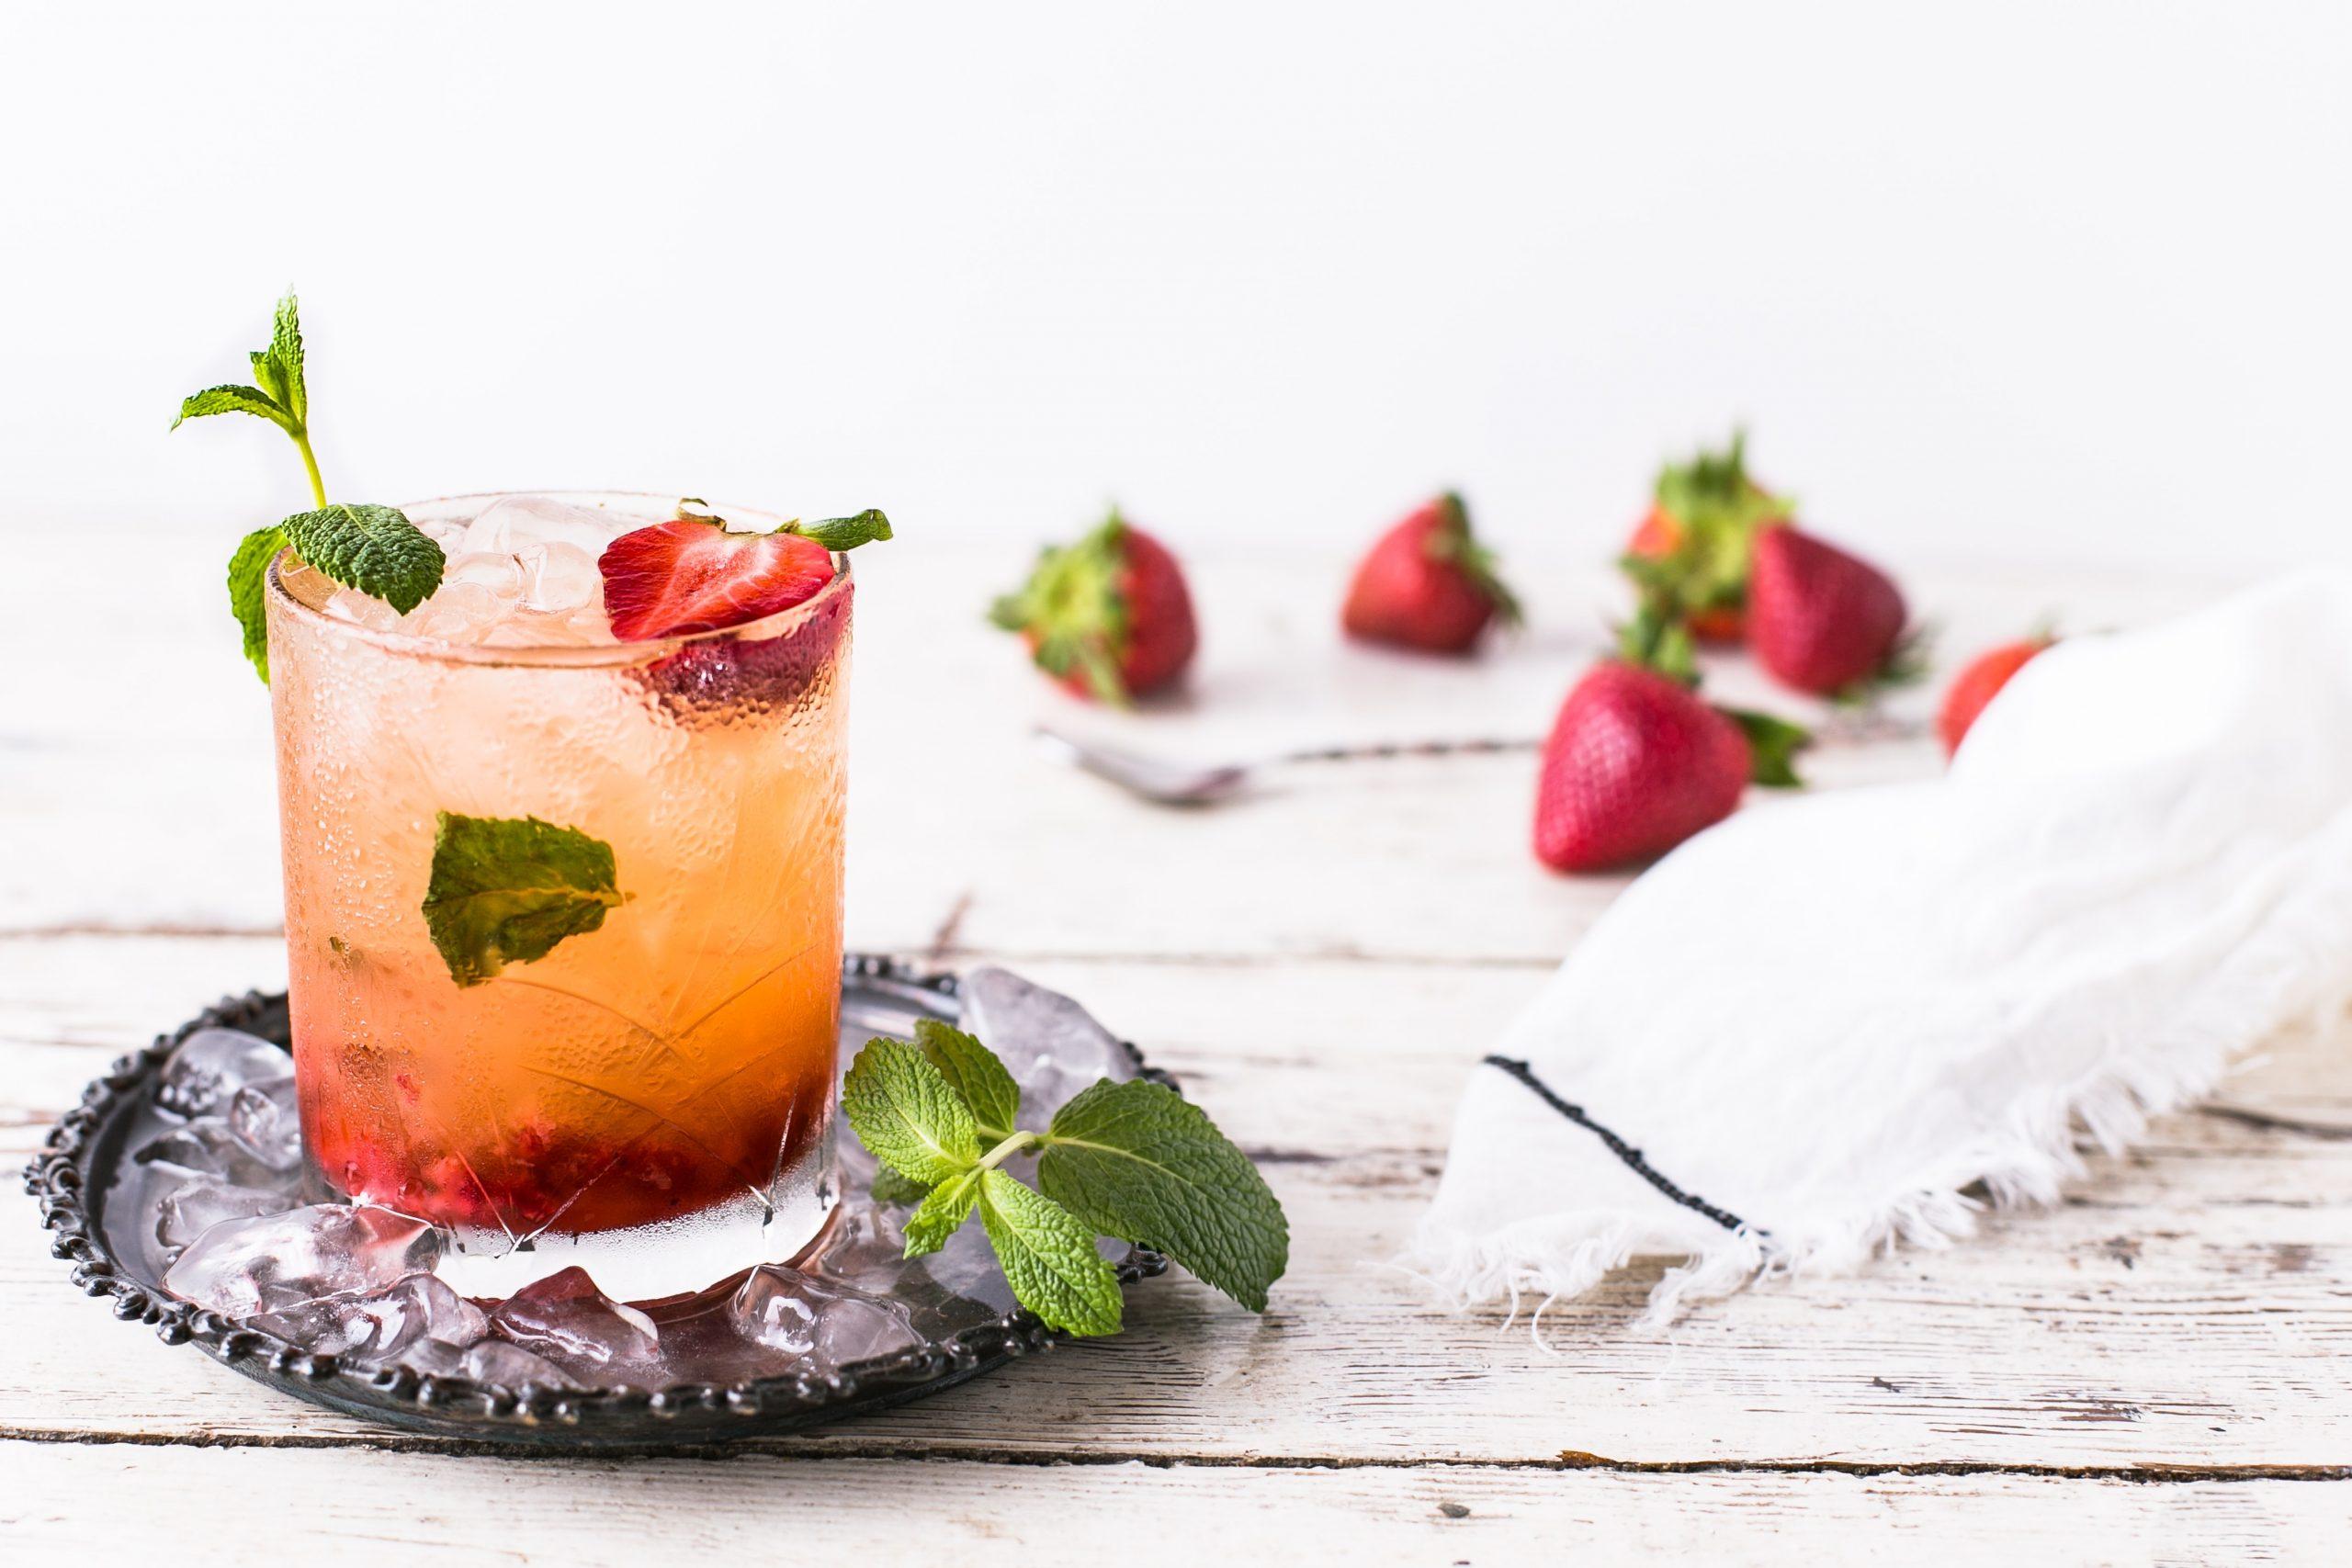 Bourbon Strawberry Basil Smash